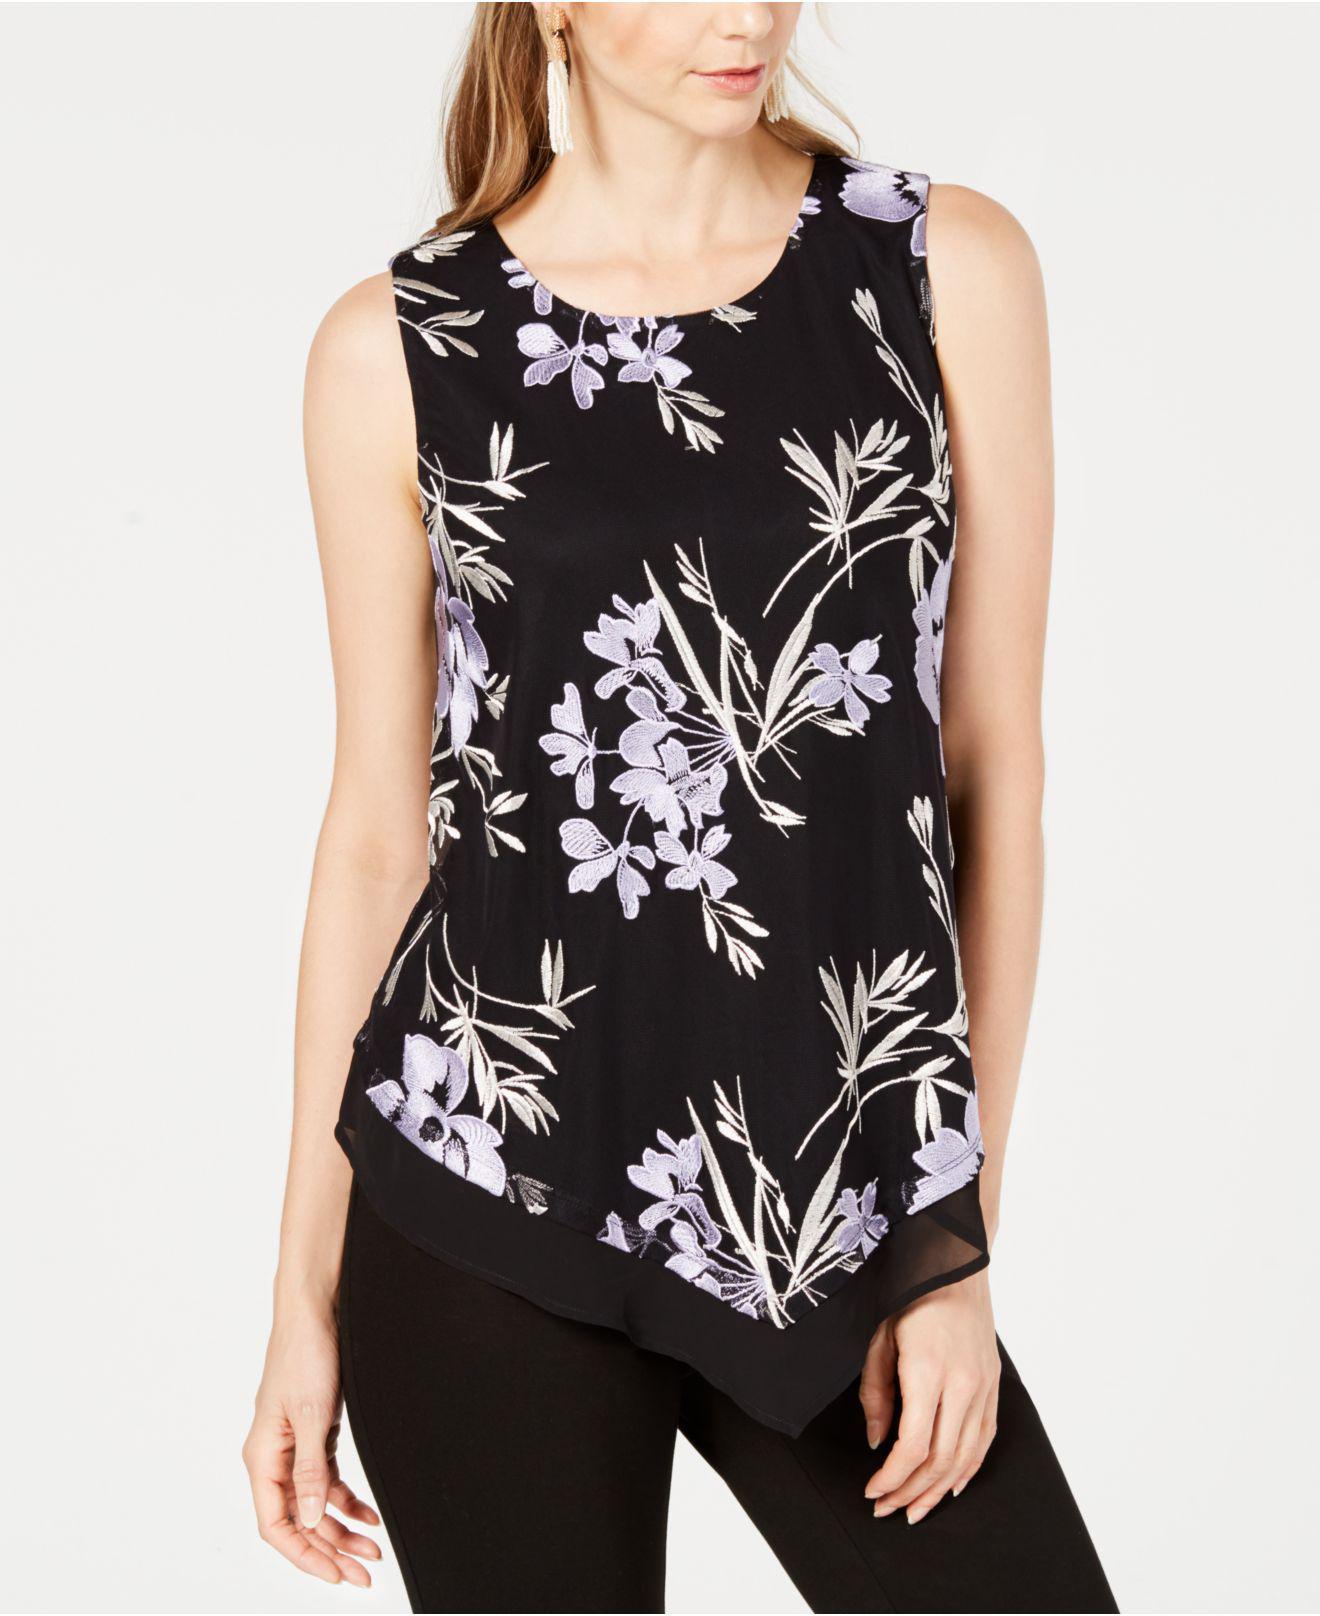 f2f596585b4 Alfani. Women s Black Embroidered Pointed-hem Top ...